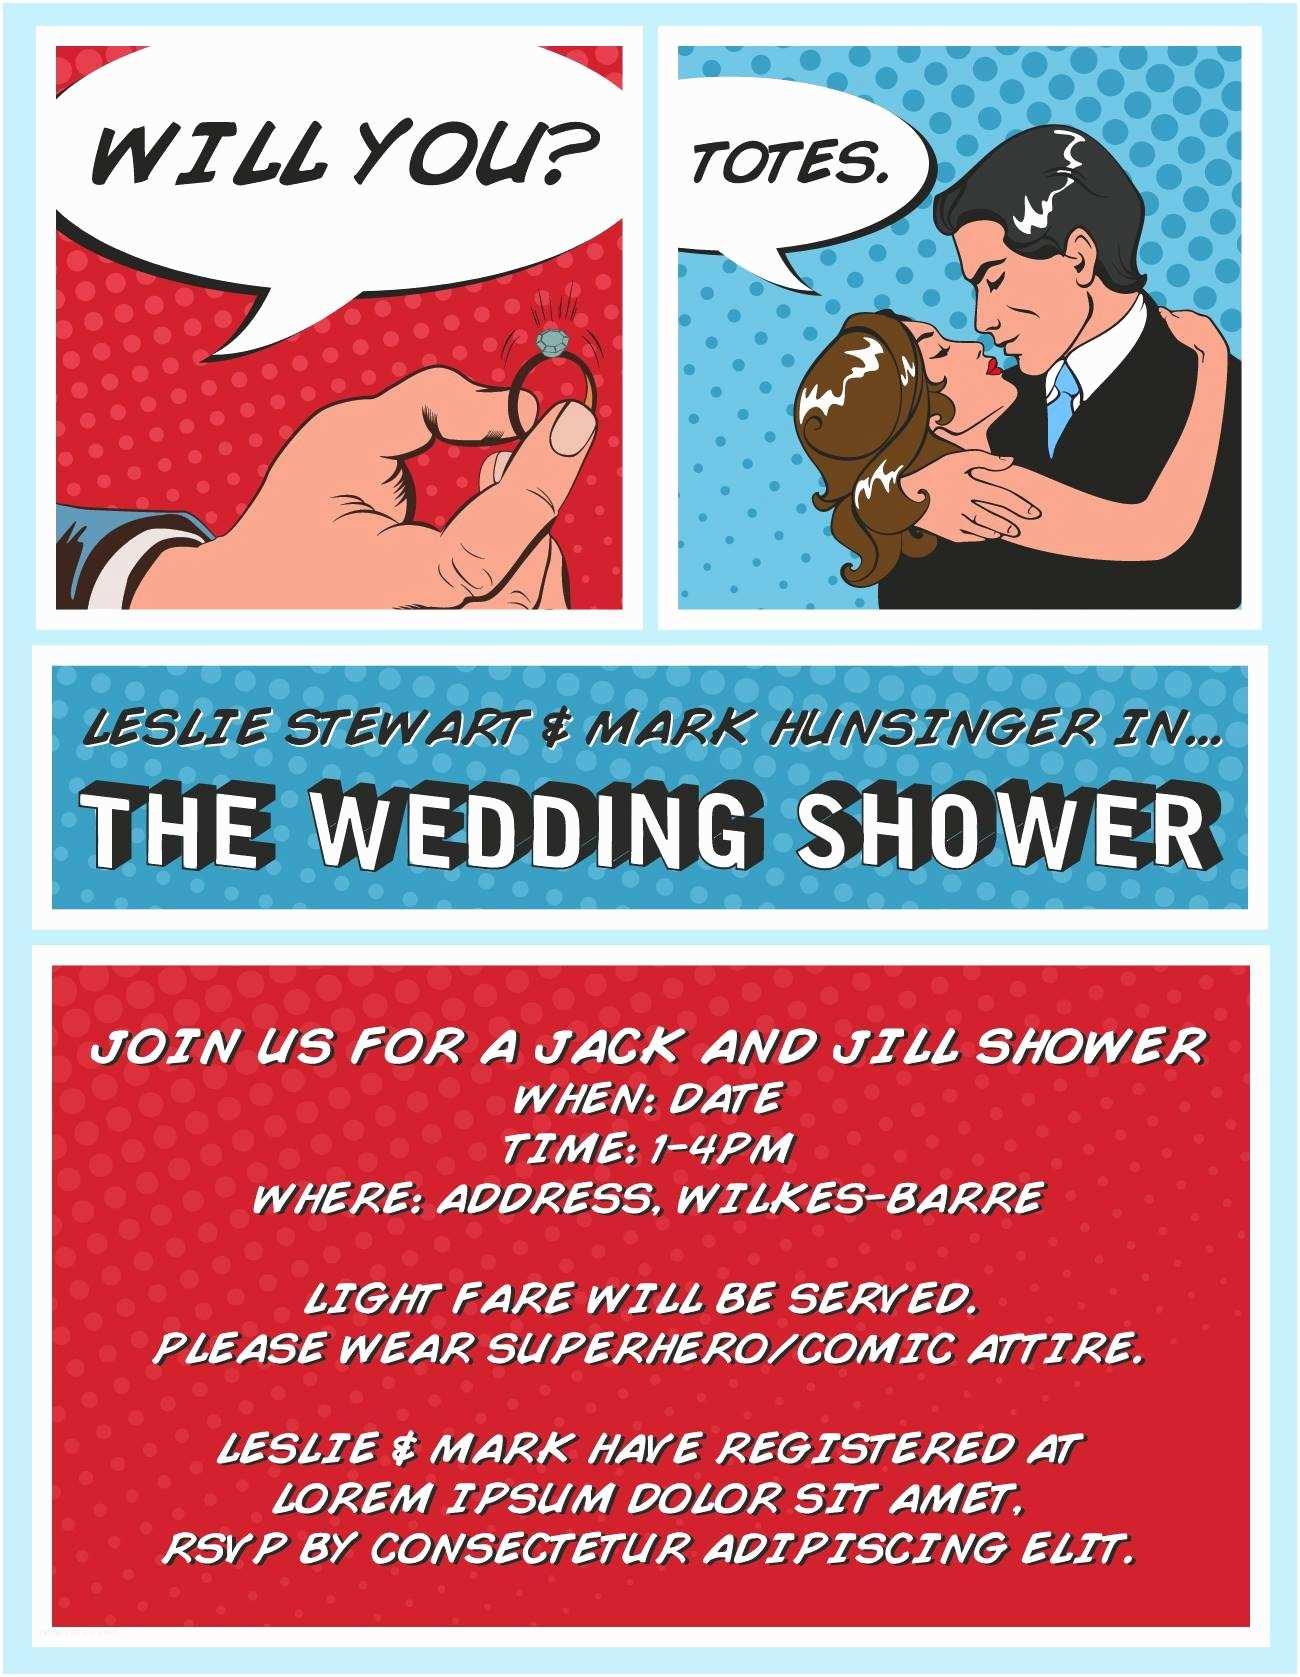 Superhero Wedding Invitations the Superhero Shower I'm Styling My Wedding Shower